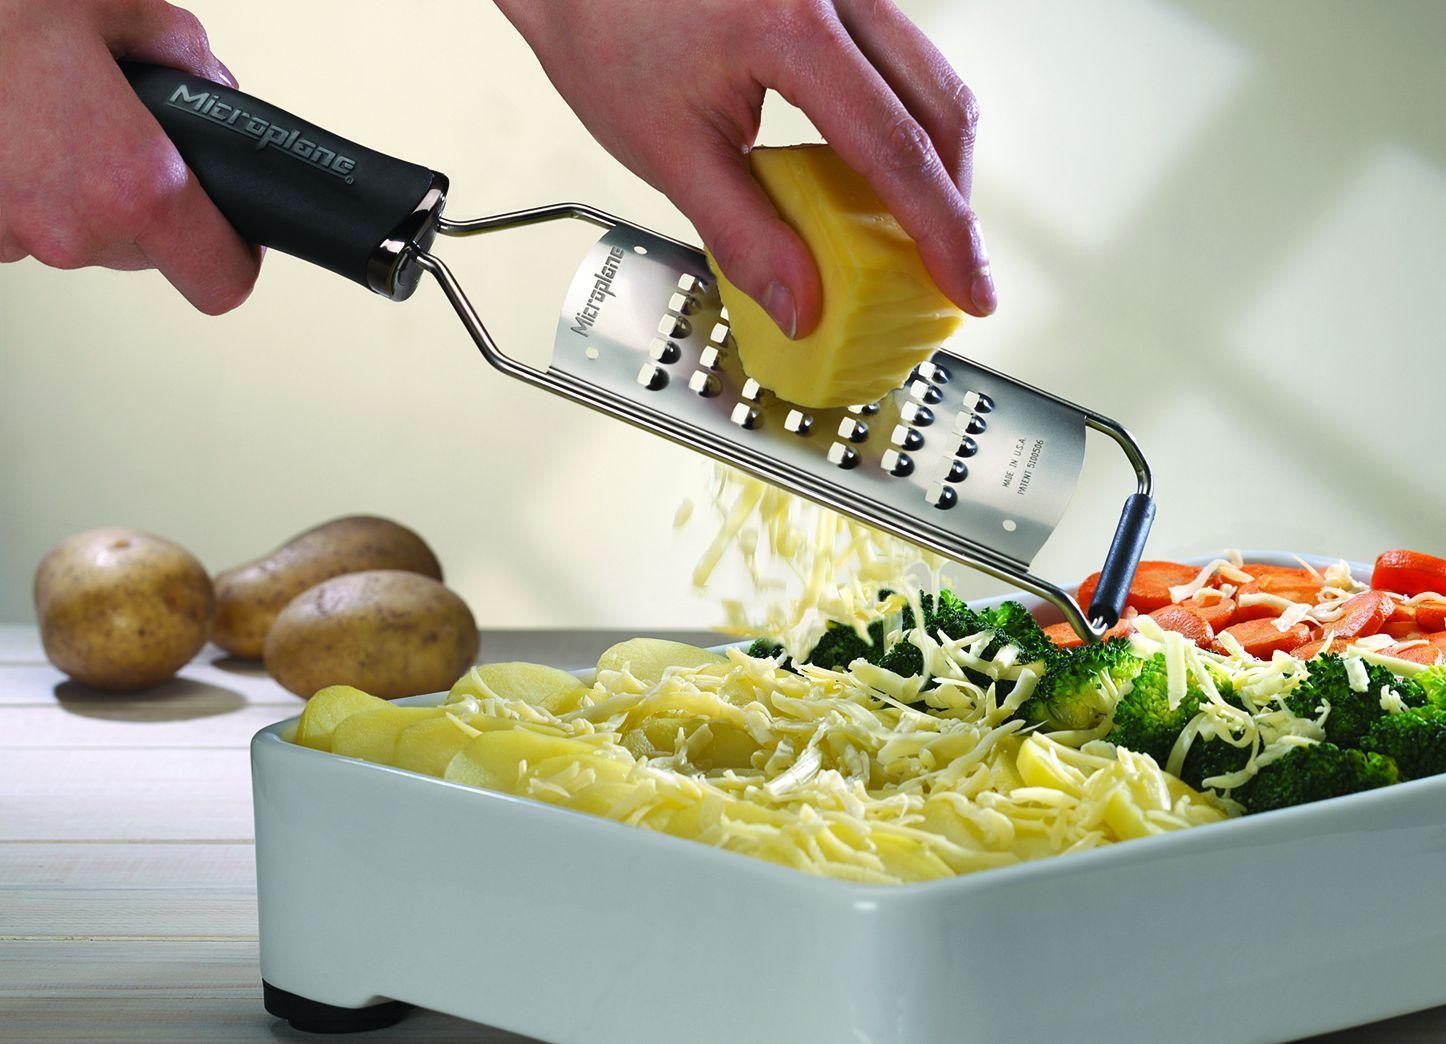 Терка Microplane Gourmet экстра крупная - 4 фото